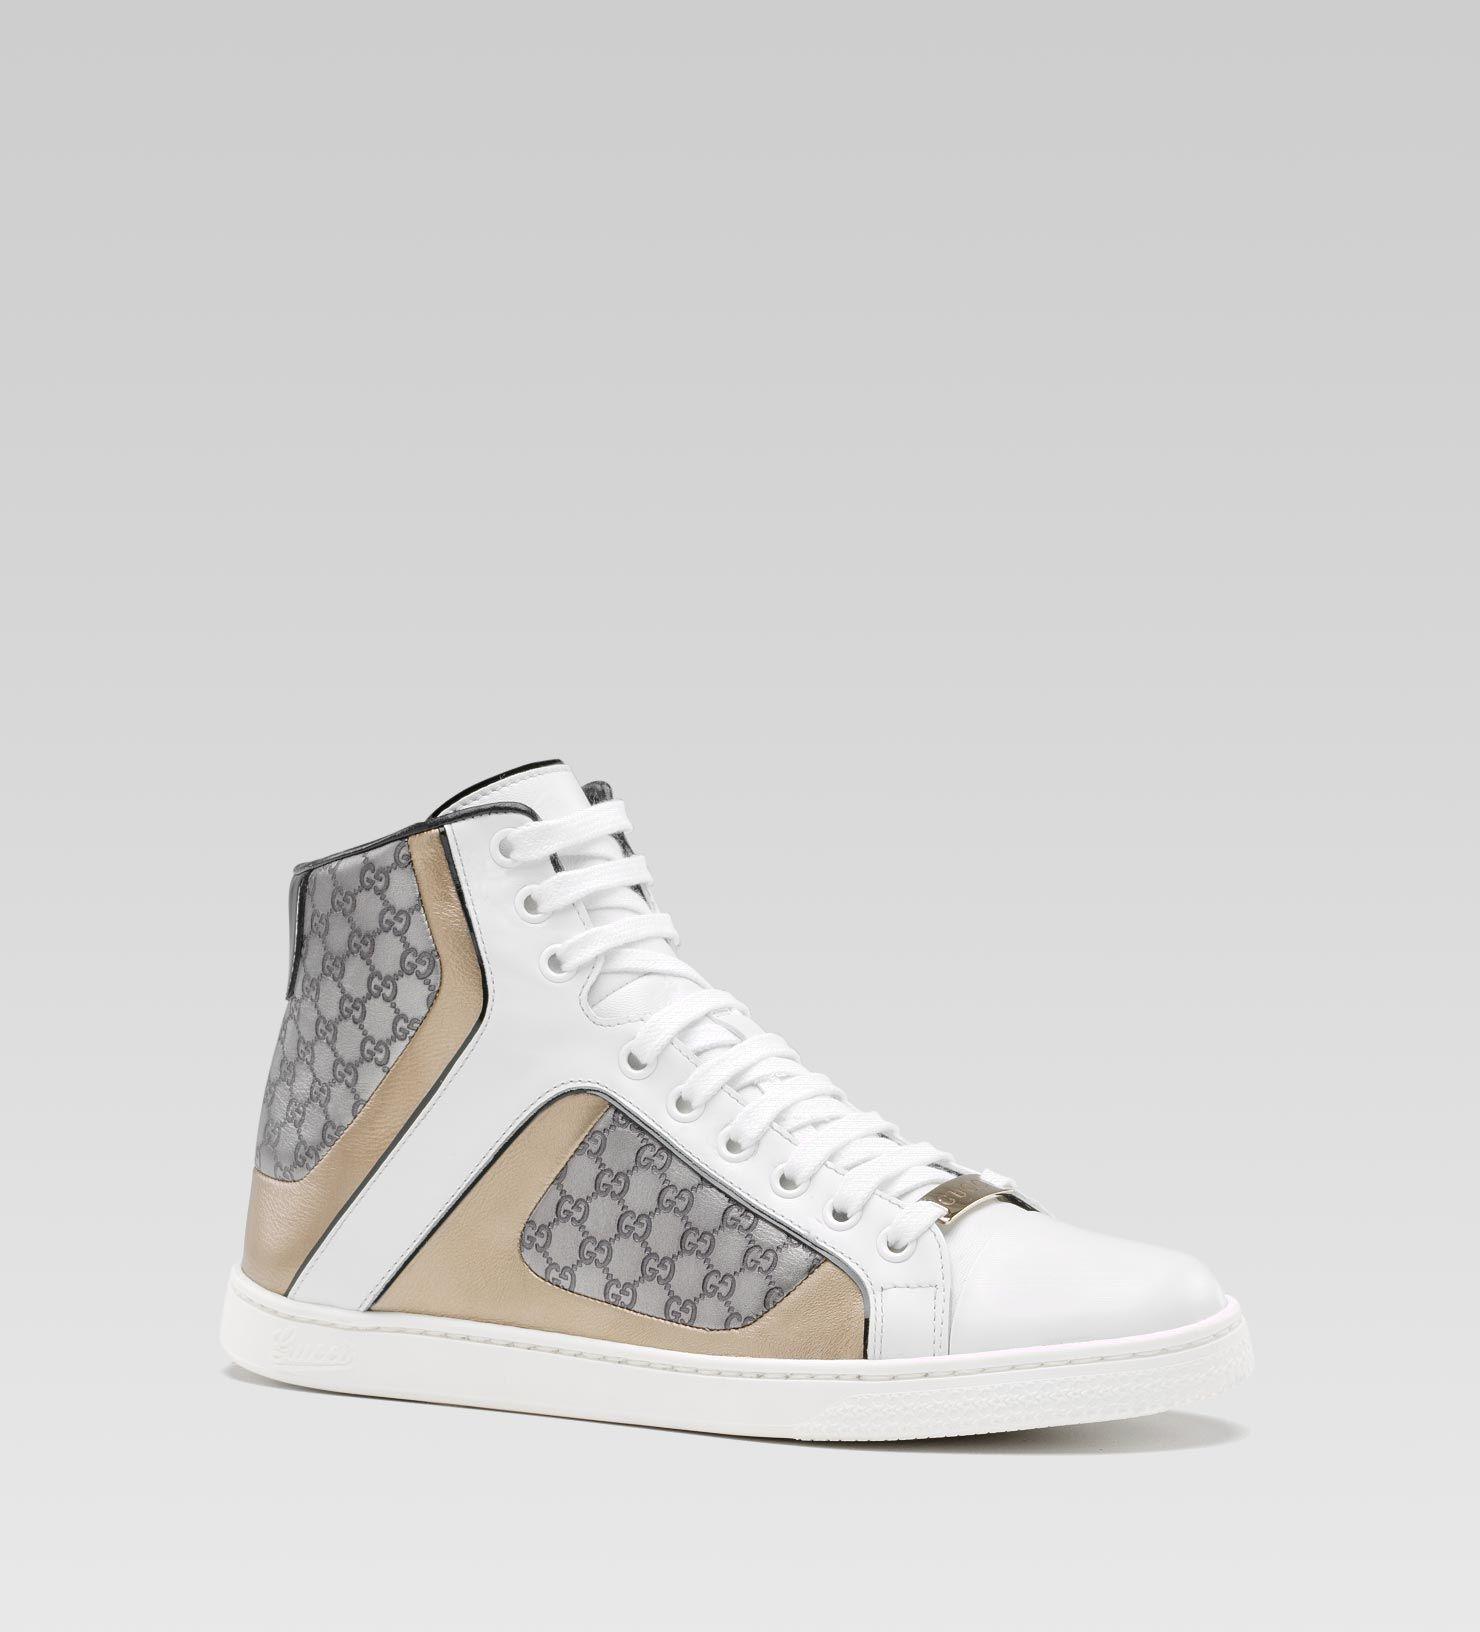 b3d552c8672 description Gucci Coda Pop white and champagne color leather with silver  color micro guccissima leather details